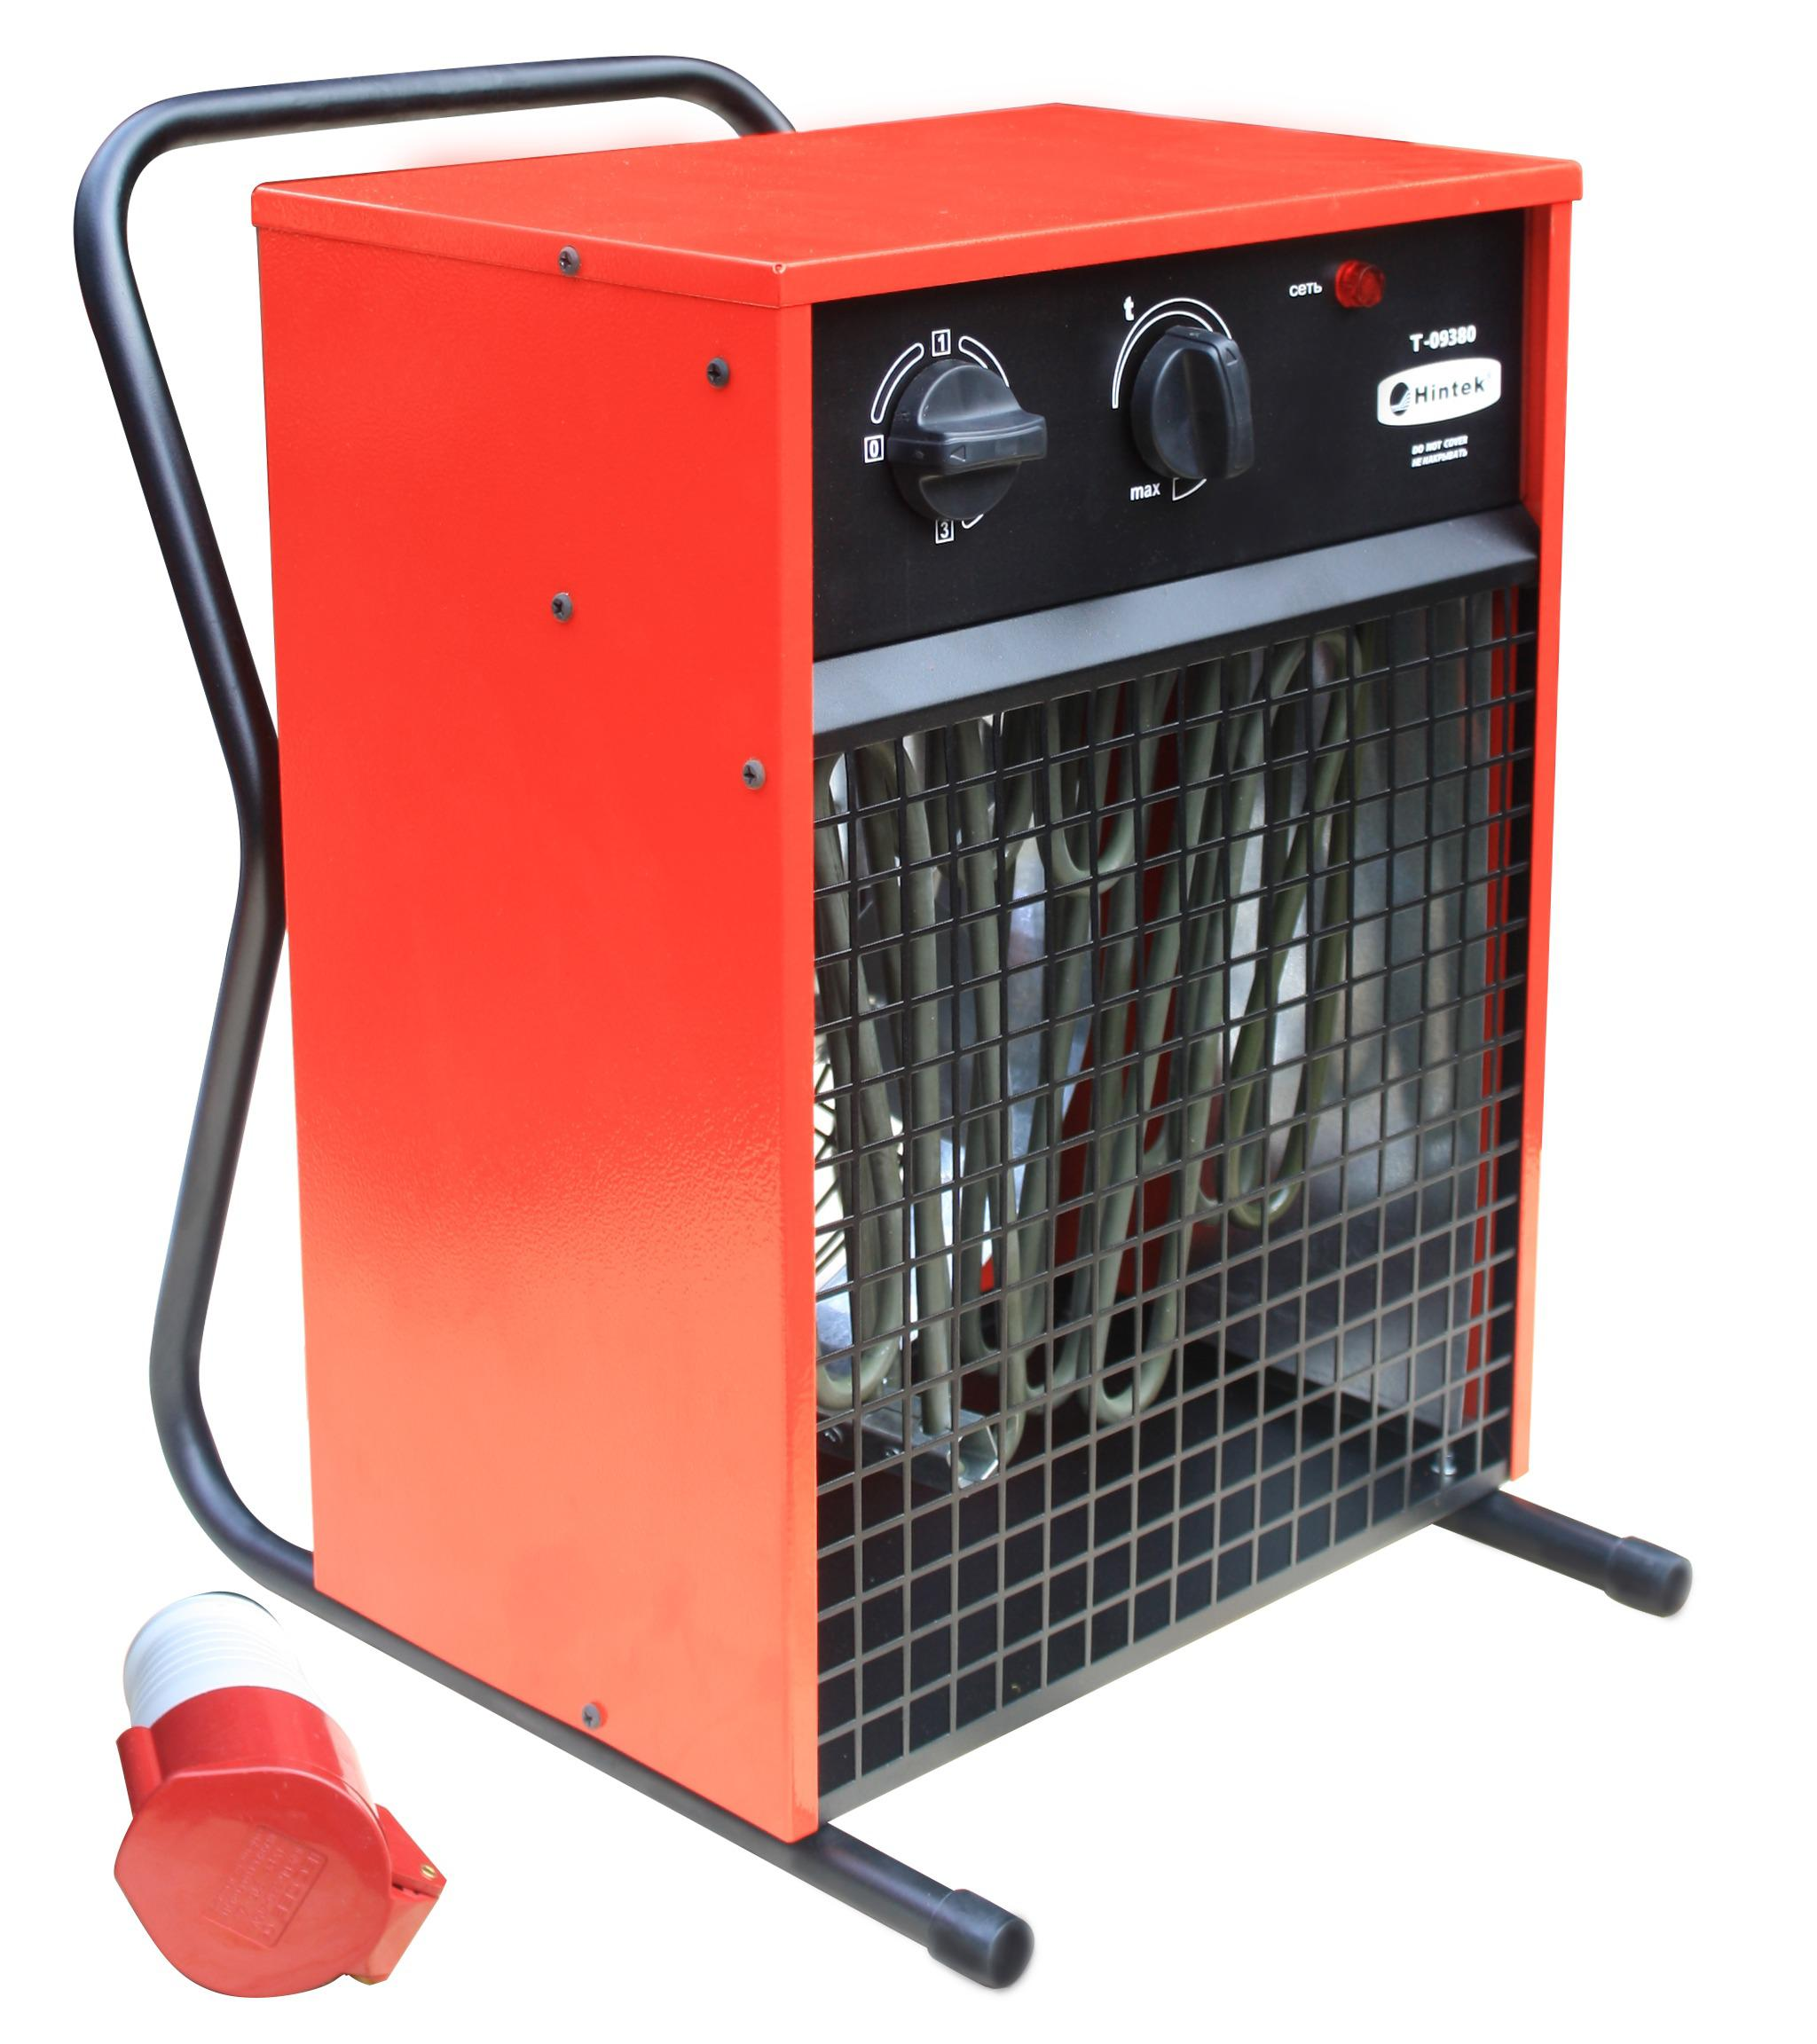 Тепловентилятор Hintek Т-09380 все цены